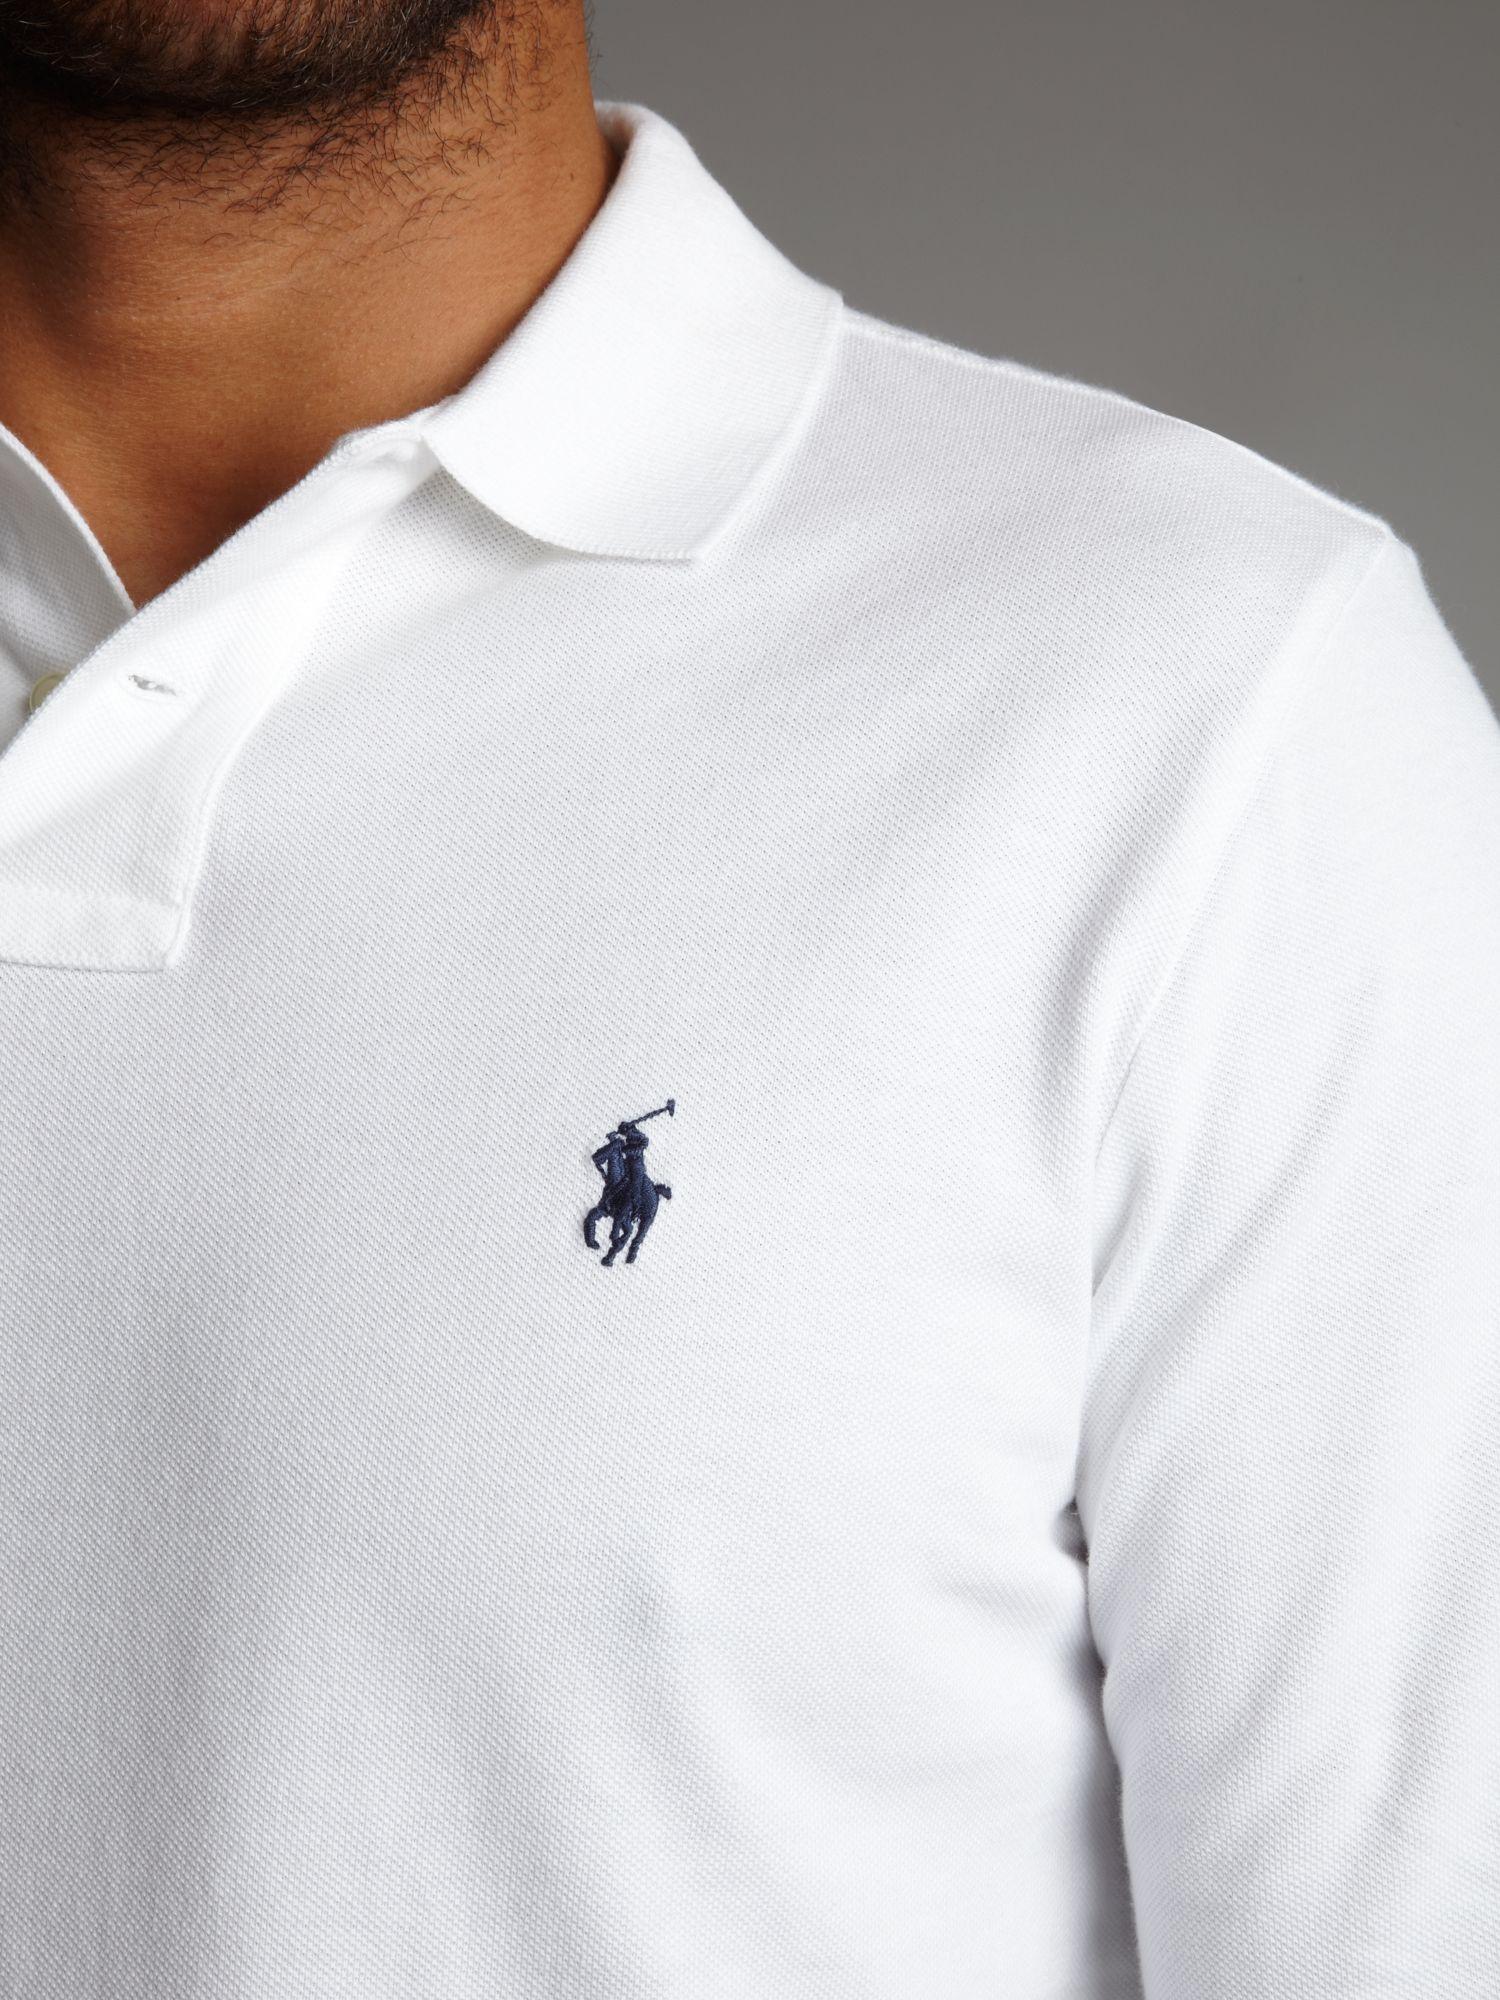 Polo ralph lauren long sleeve polo shirt in white for men for Long sleeve fitted polo shirts